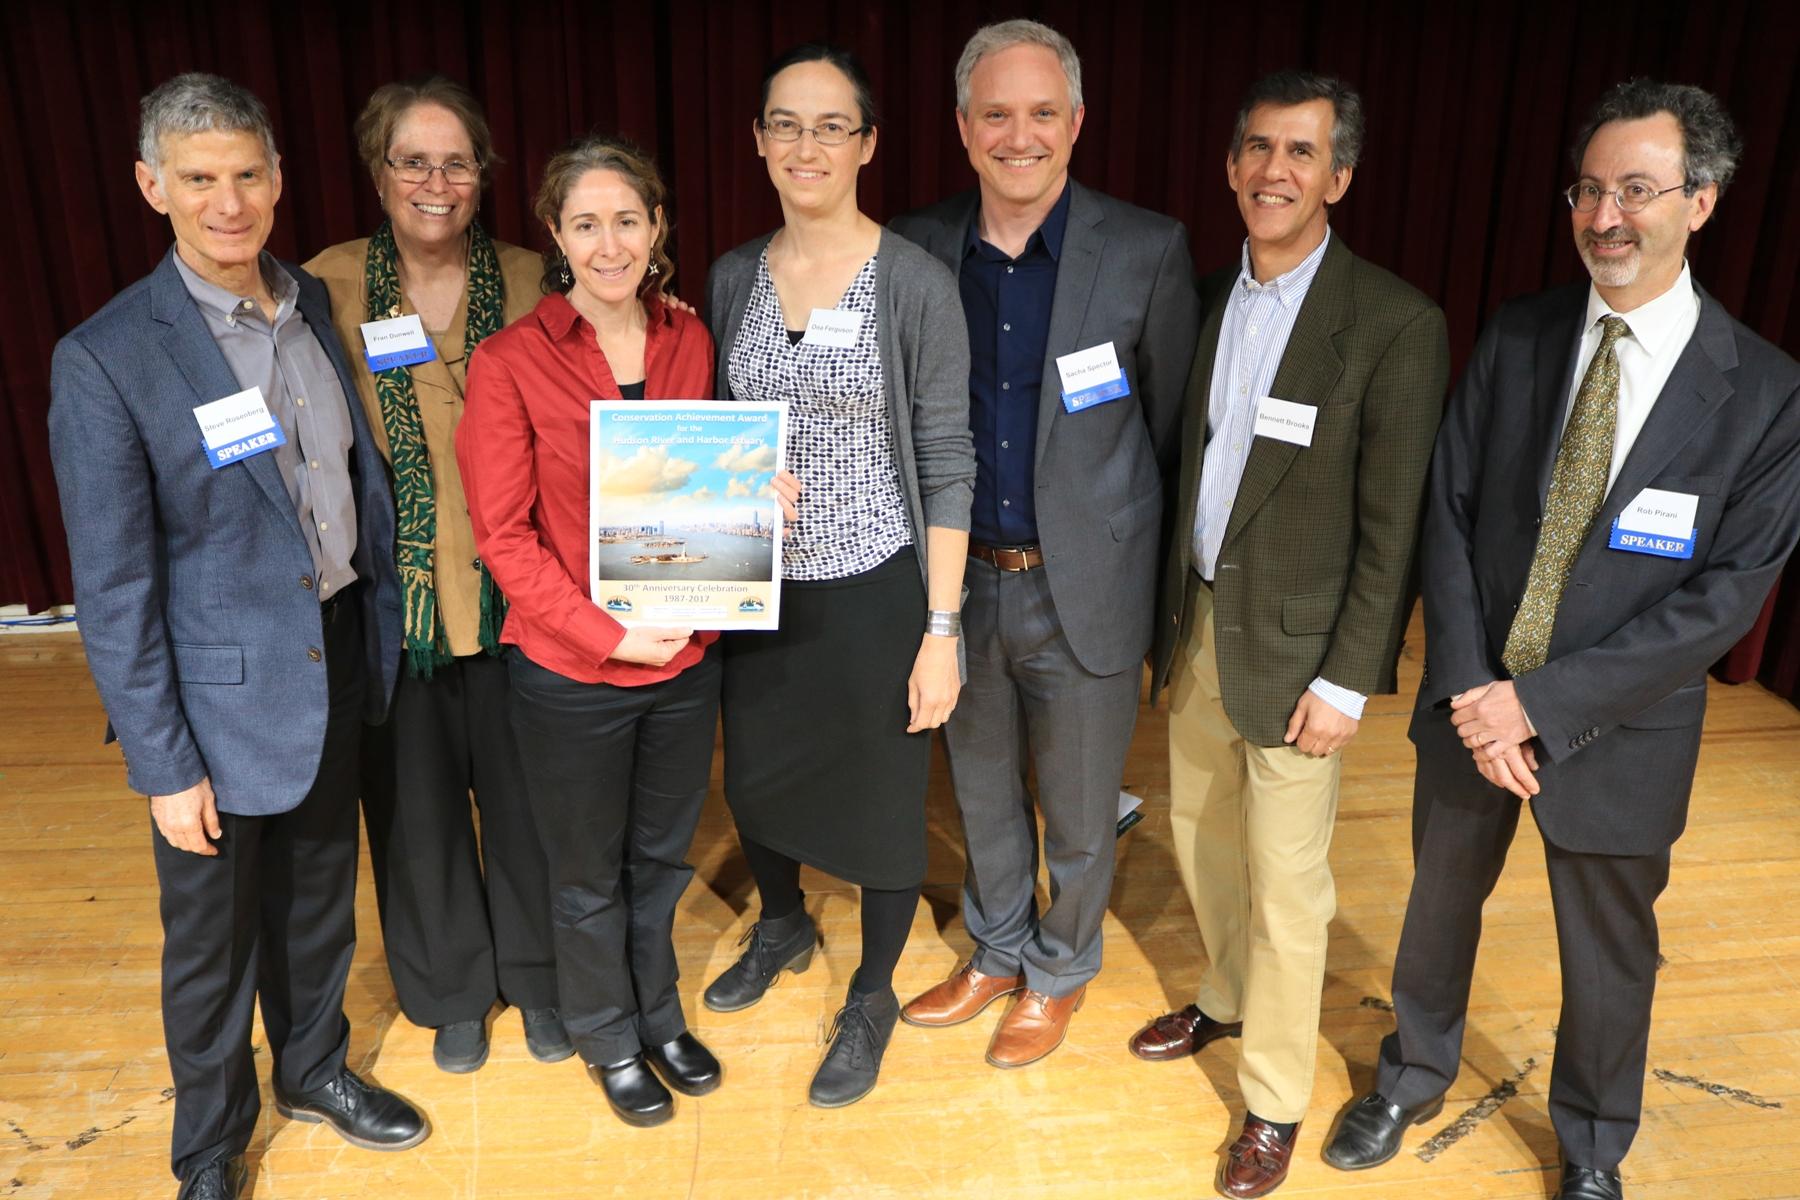 Conservation Achievement Award